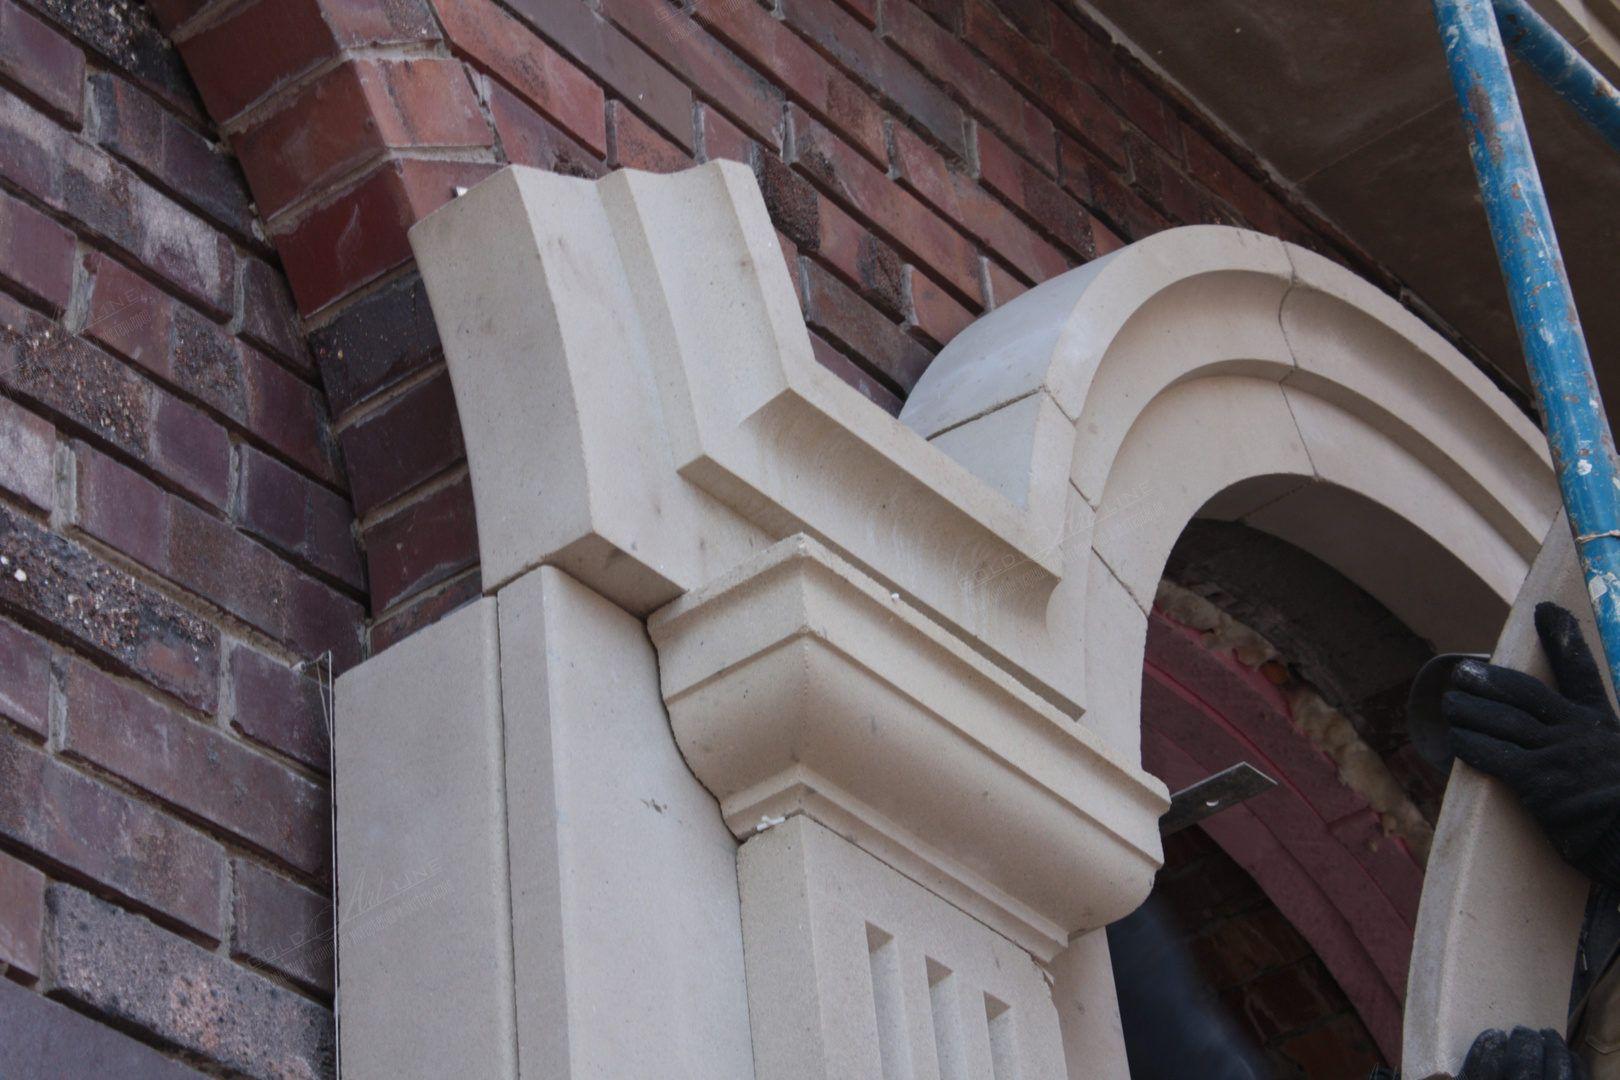 Фасадный декор фибробетона туалет из керамзитобетона